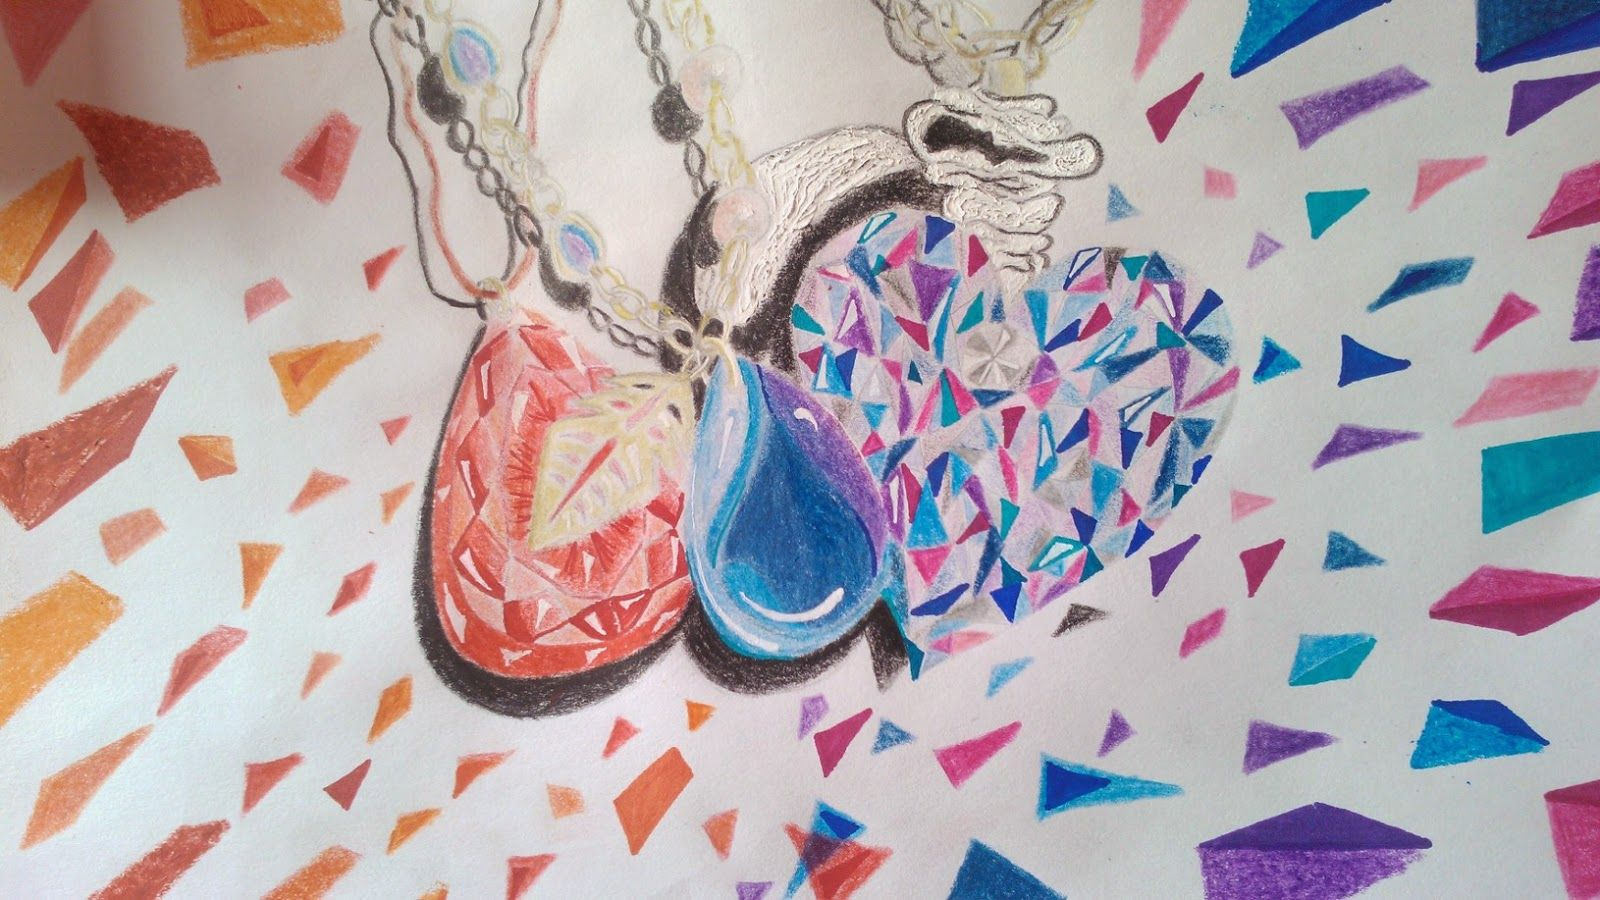 Dibujando joyería fina ... http://youtu.be/SNp-Fl7SsQo